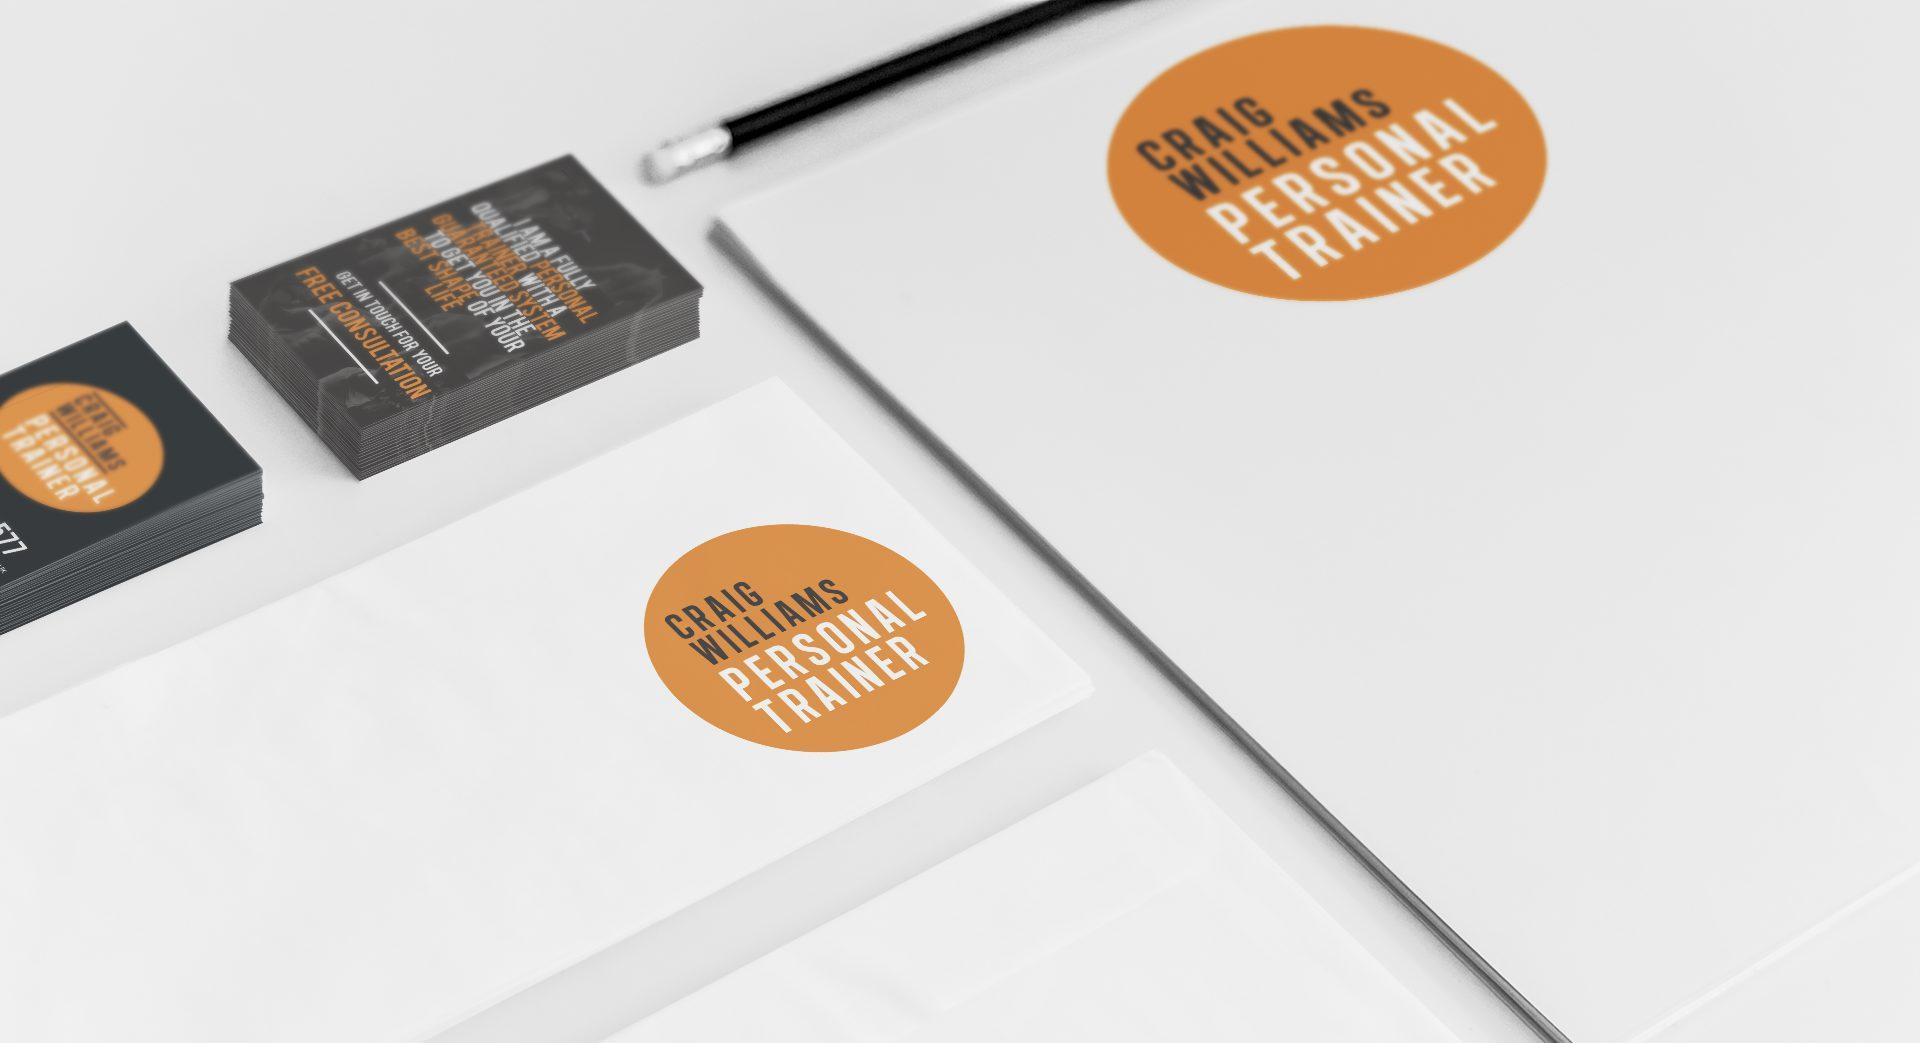 personal-trainer-branding-design-image